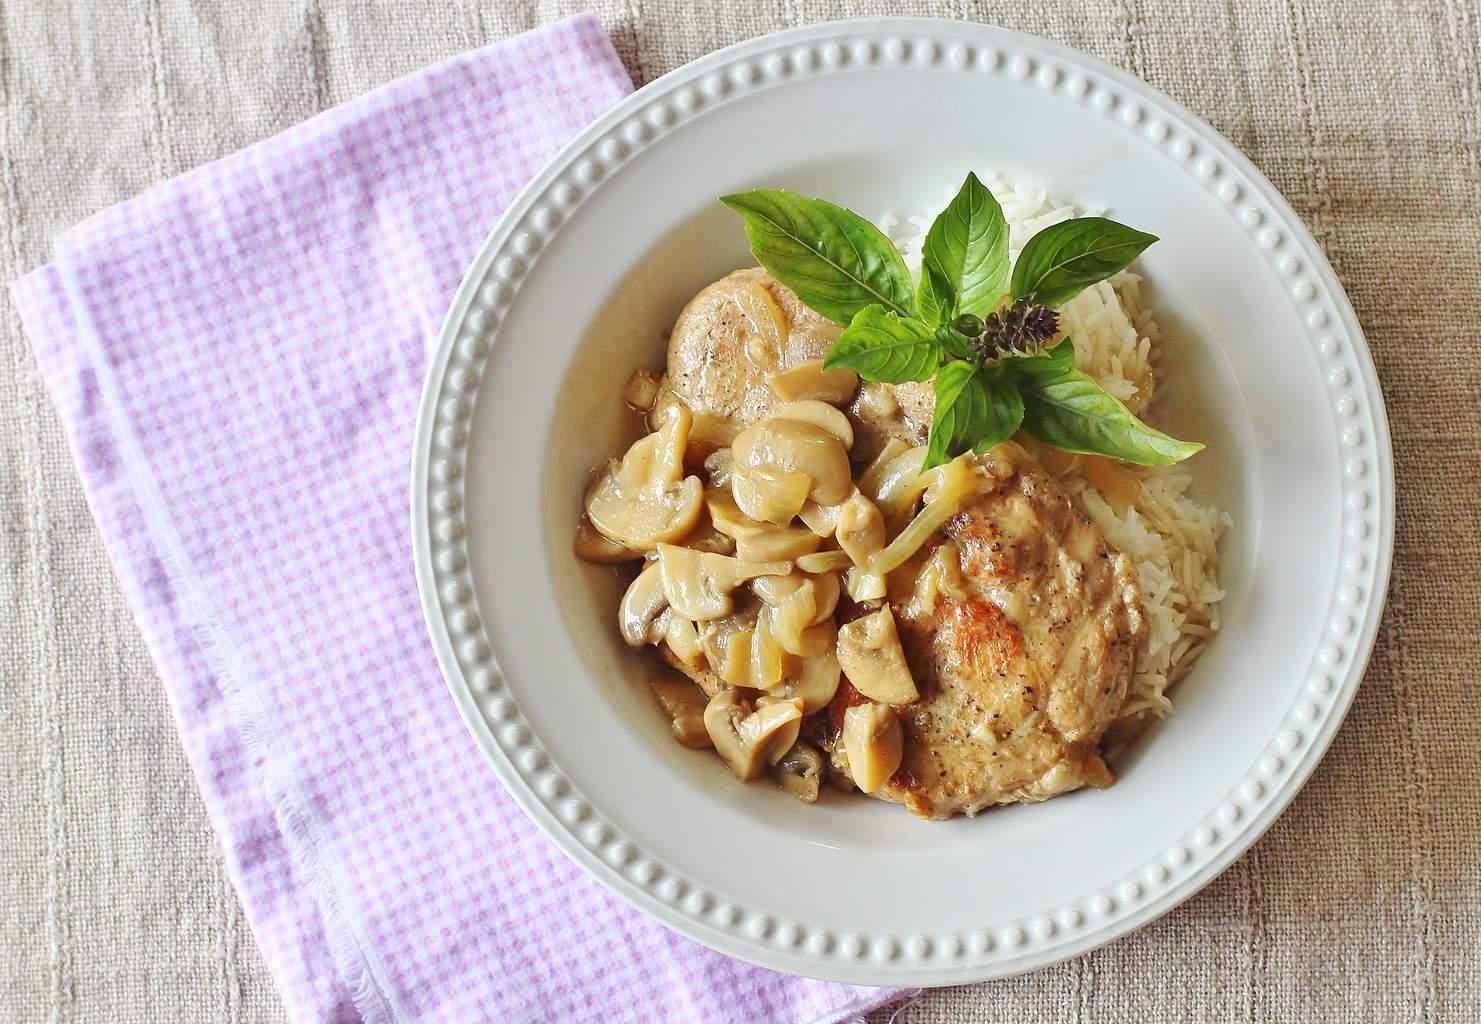 Baked Pork Chops with Mushroom Onion Gravy